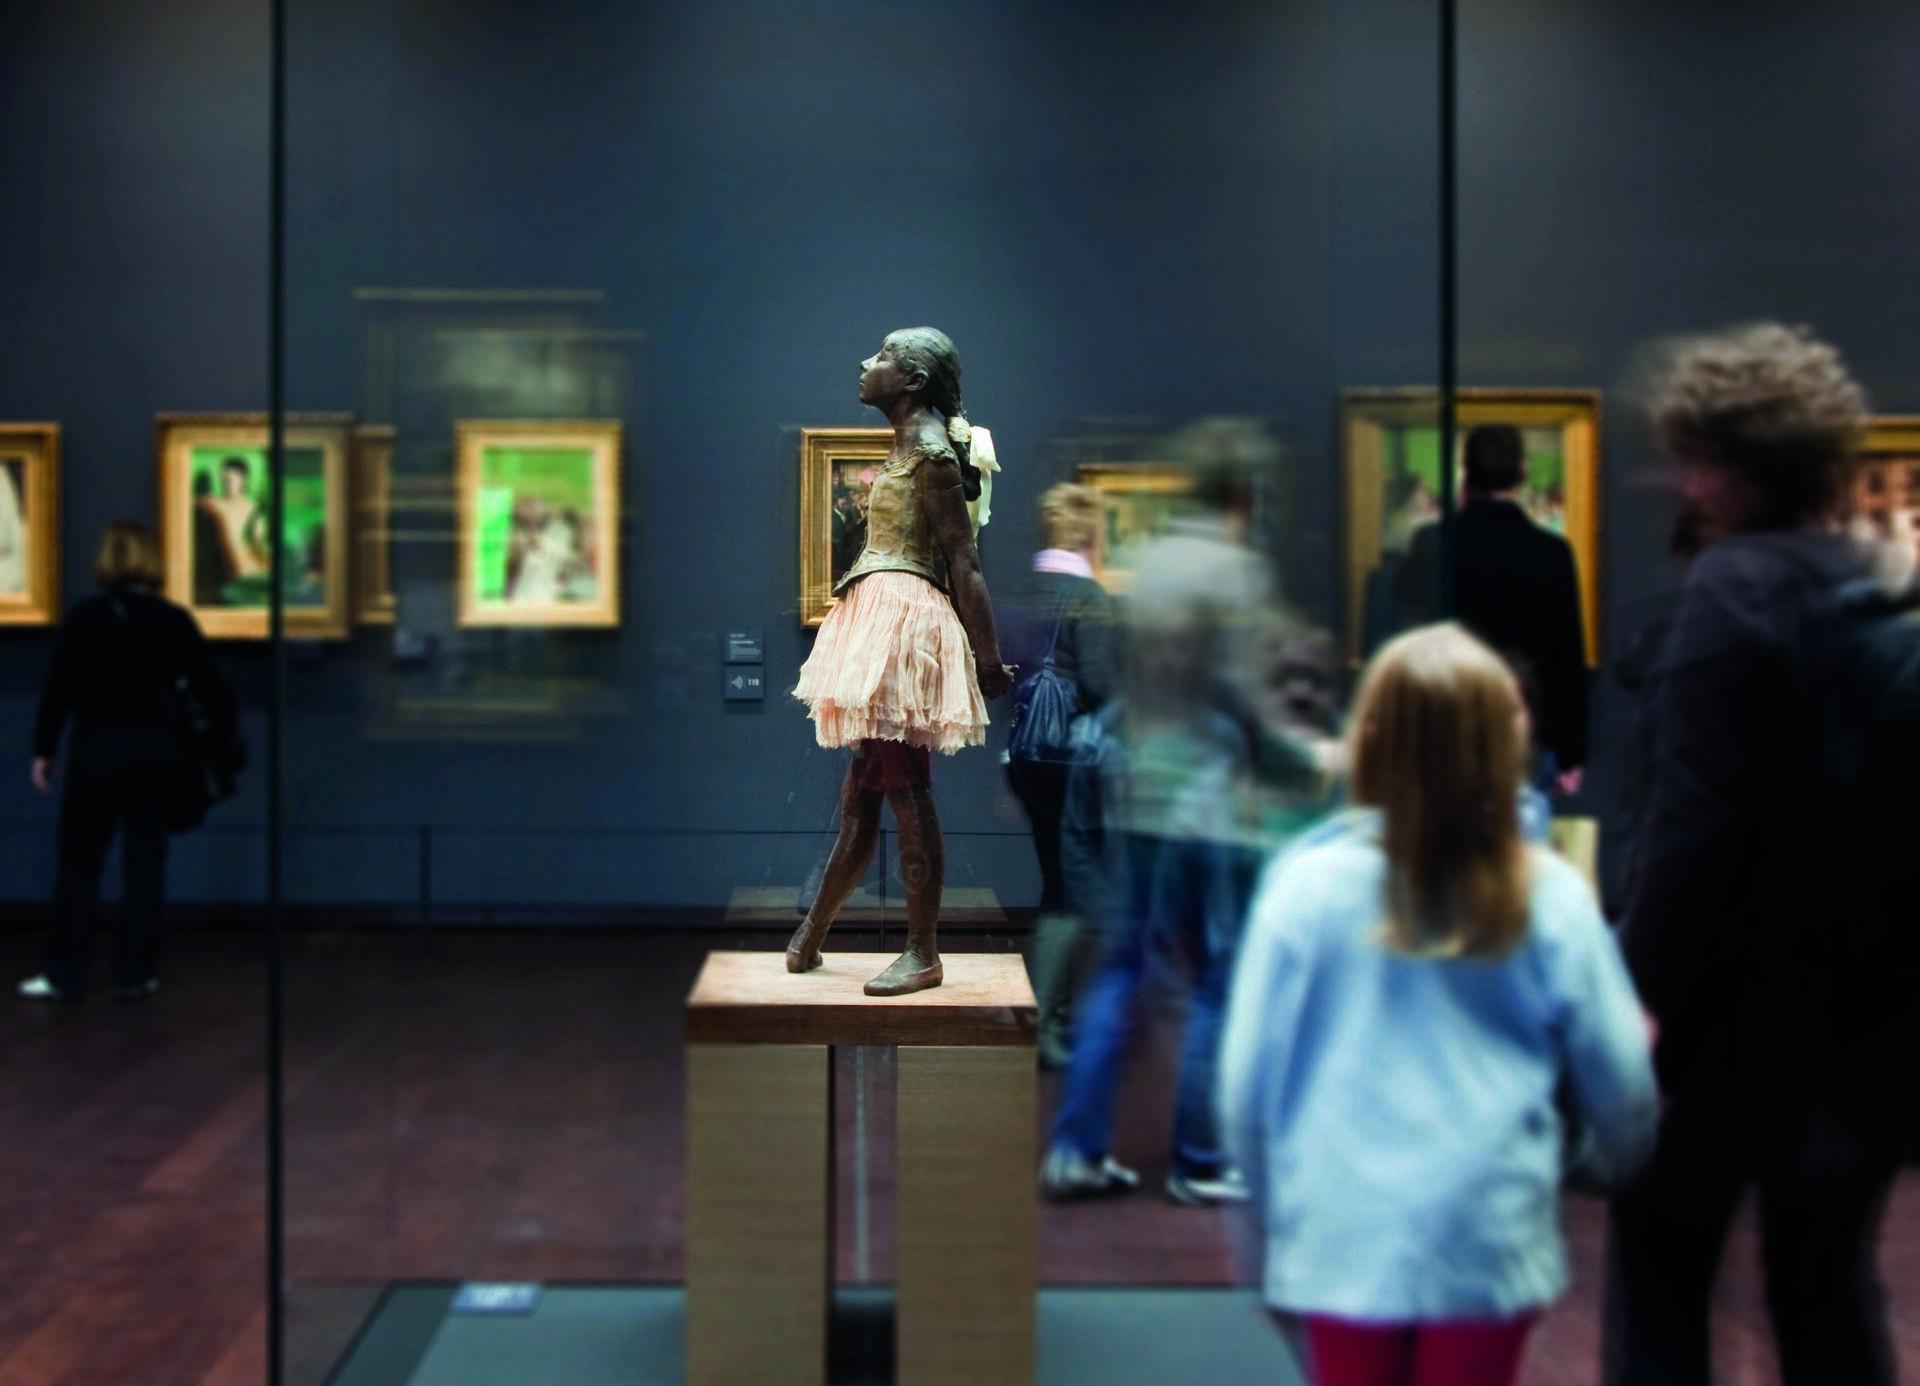 Musée d'Orsay, salle impressionniste